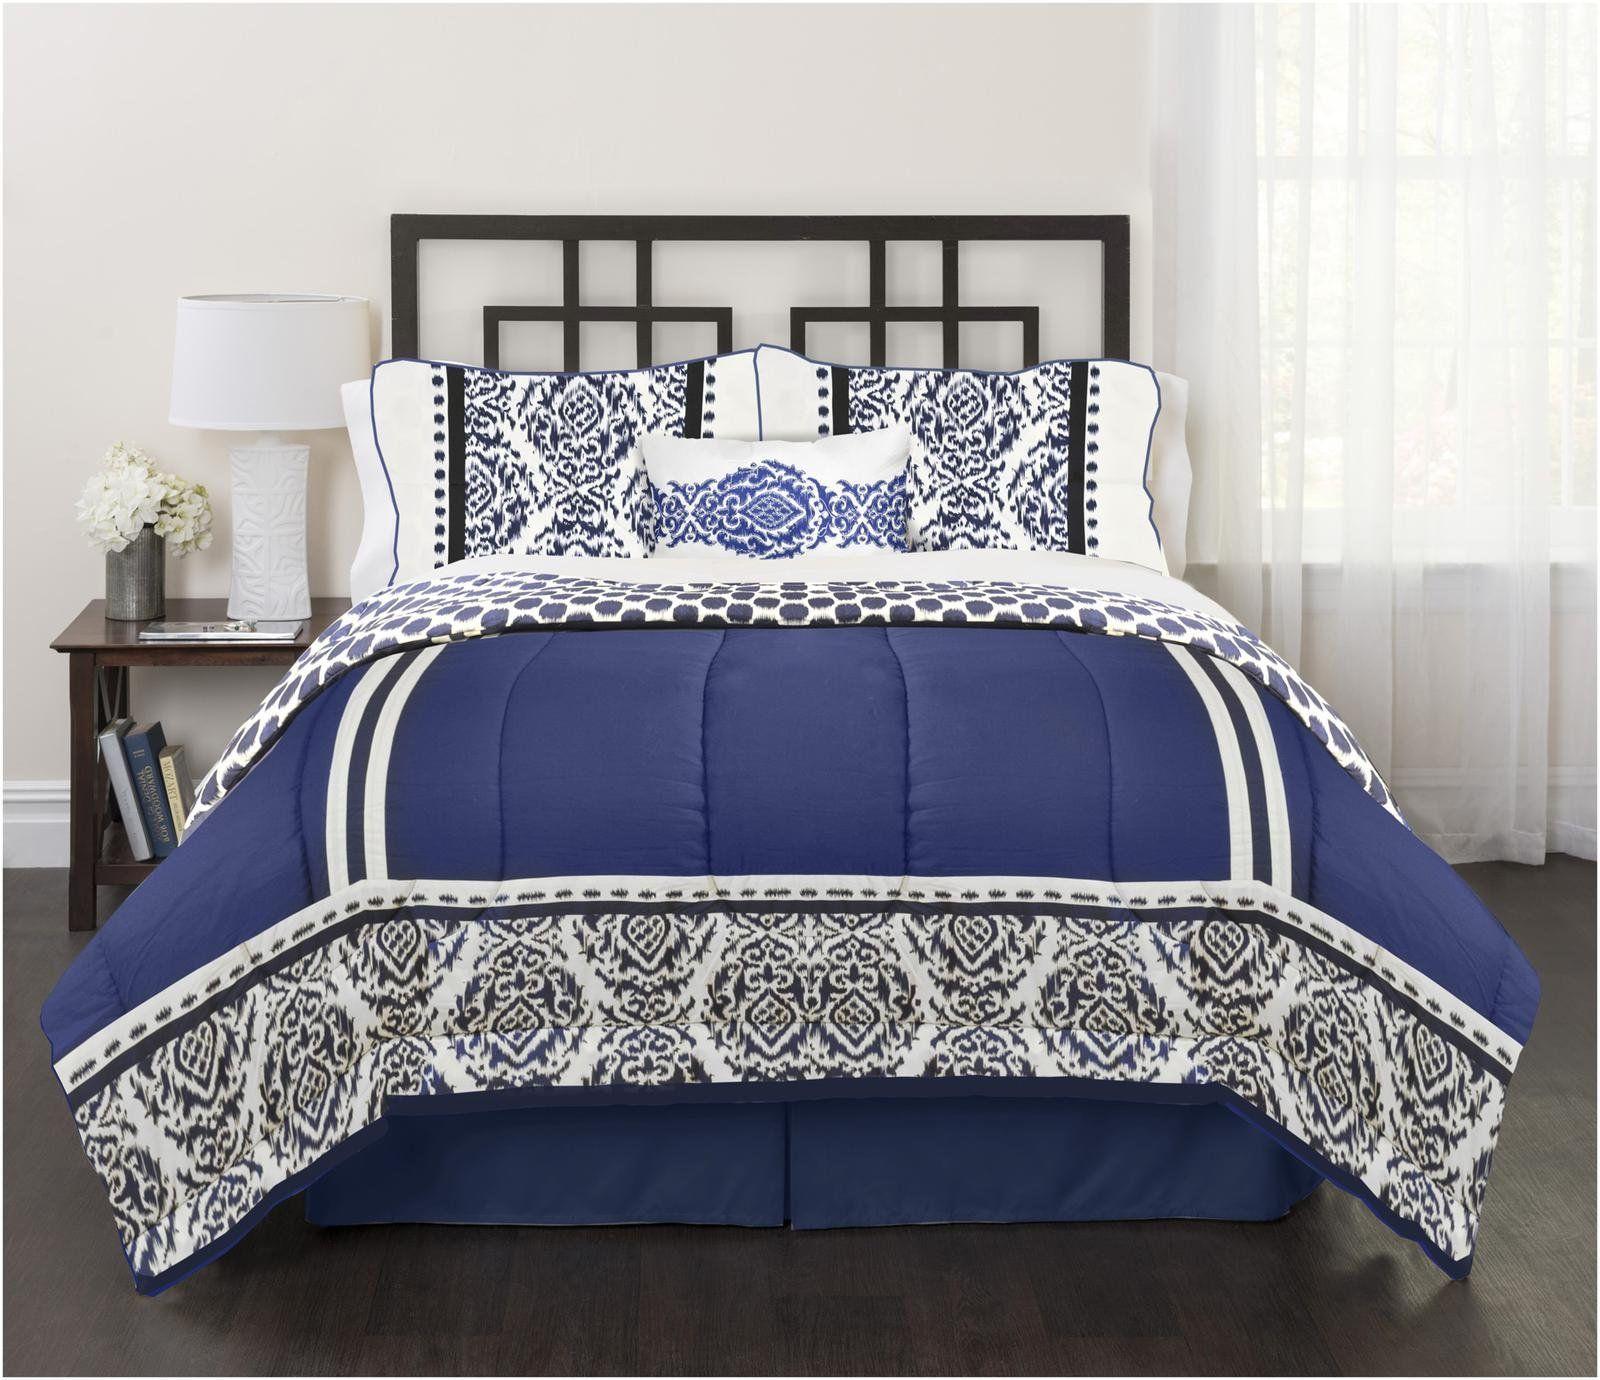 Stylehouse India Loft Bedding 4PC Set - Queen - 4